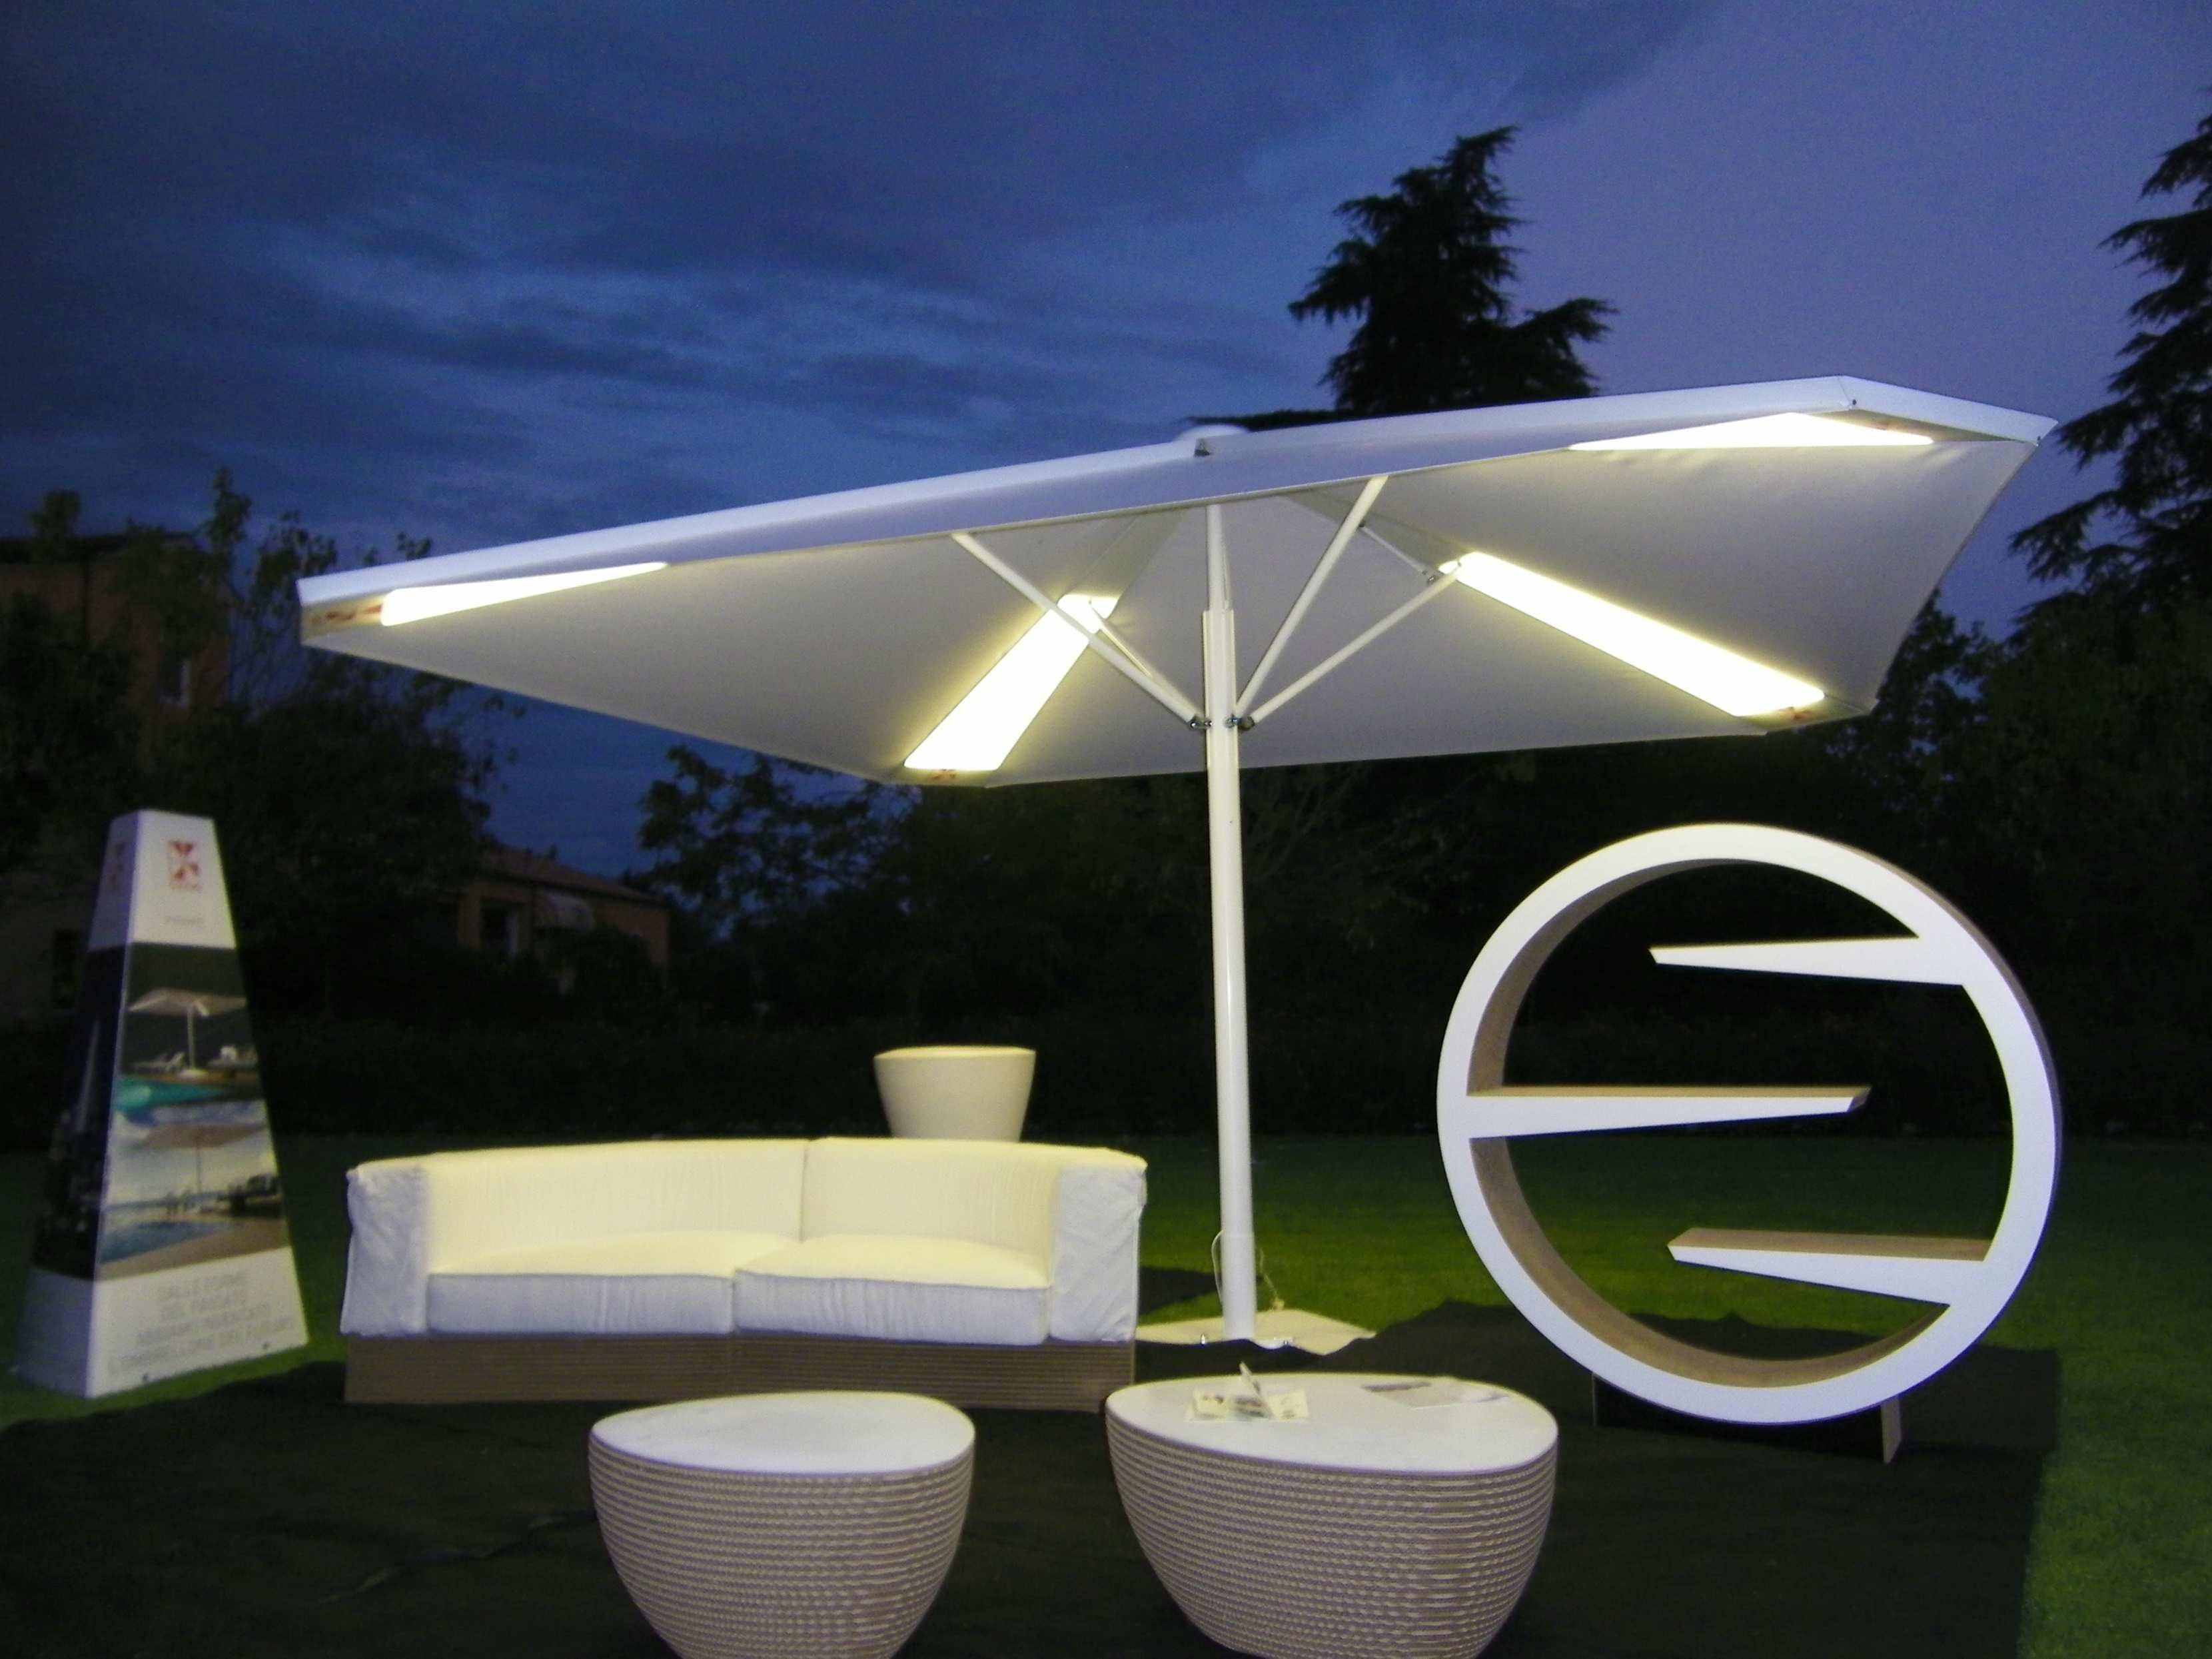 parasol de luxe professionnel pyramid un parasol haut. Black Bedroom Furniture Sets. Home Design Ideas